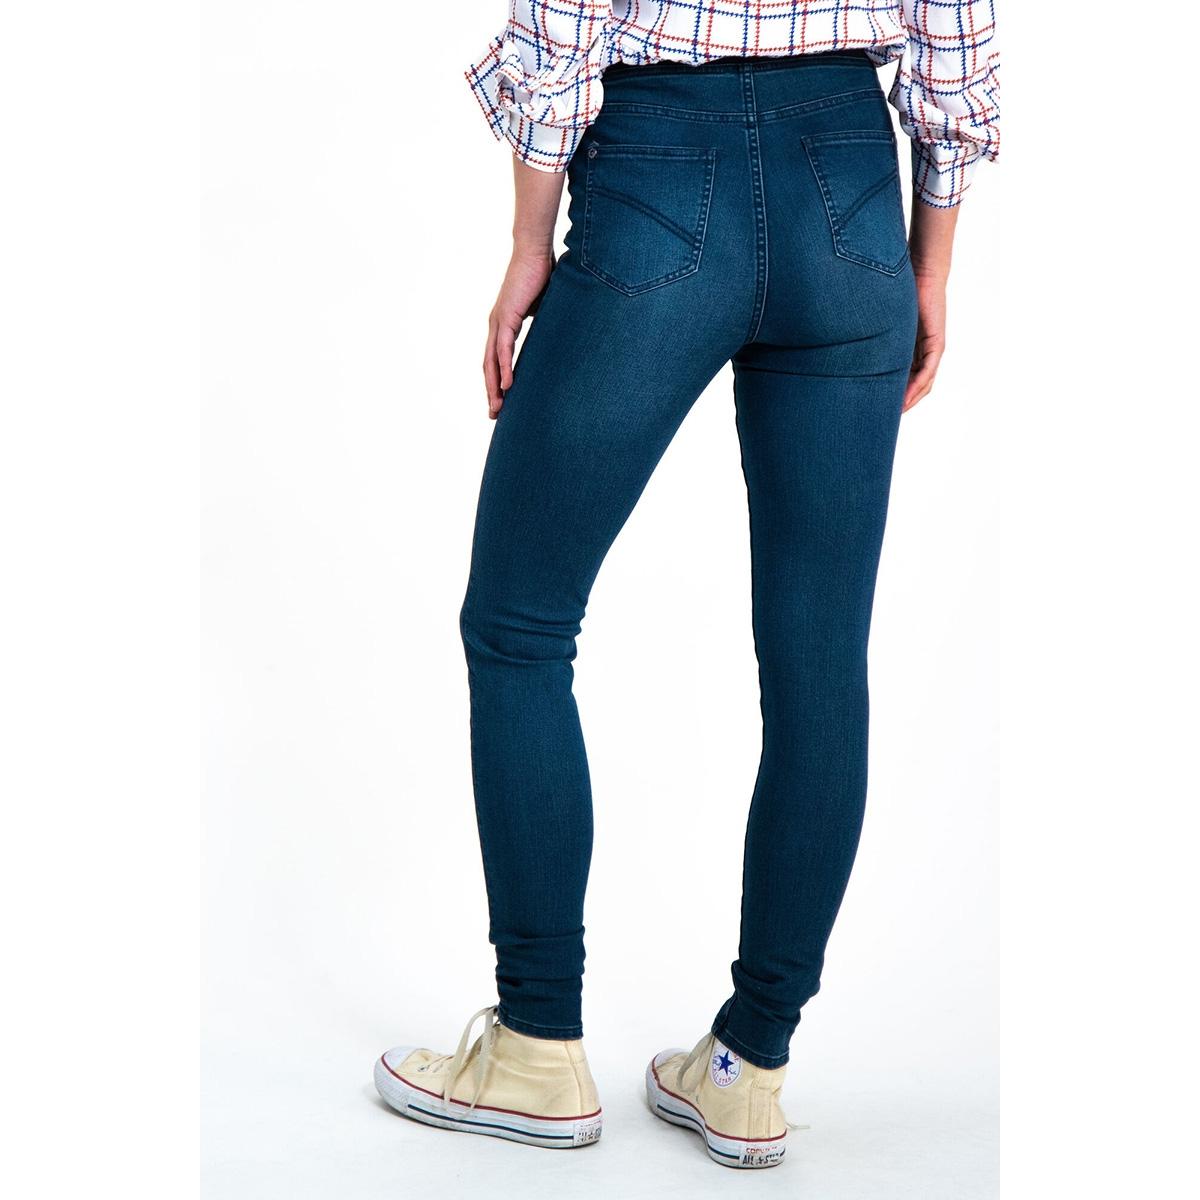 ravenna jegging gs900710 garcia legging 2673 mid blue used